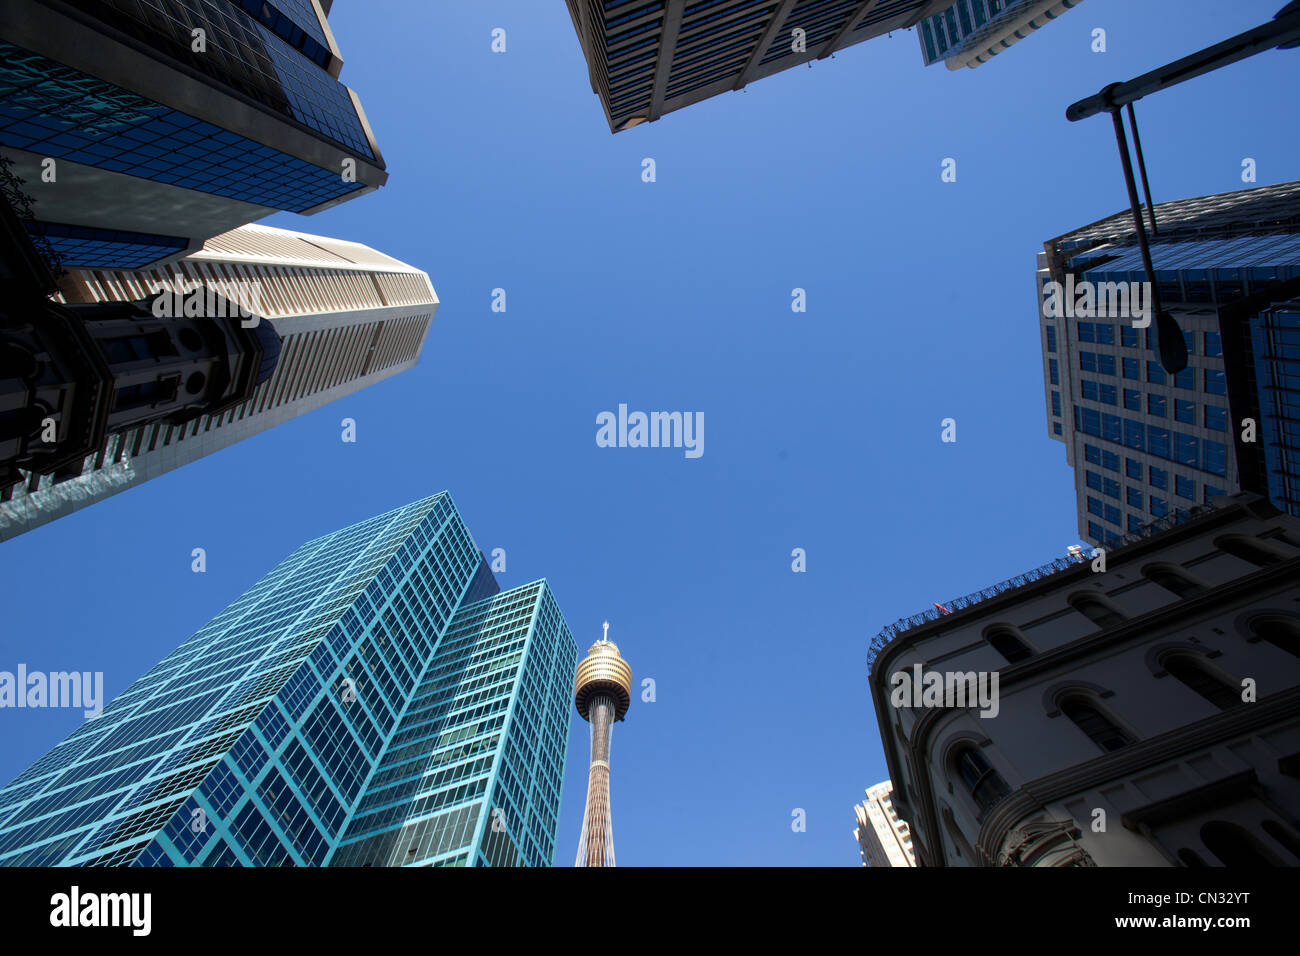 Looking upwards Sydney New South Wales Australia - Stock Image